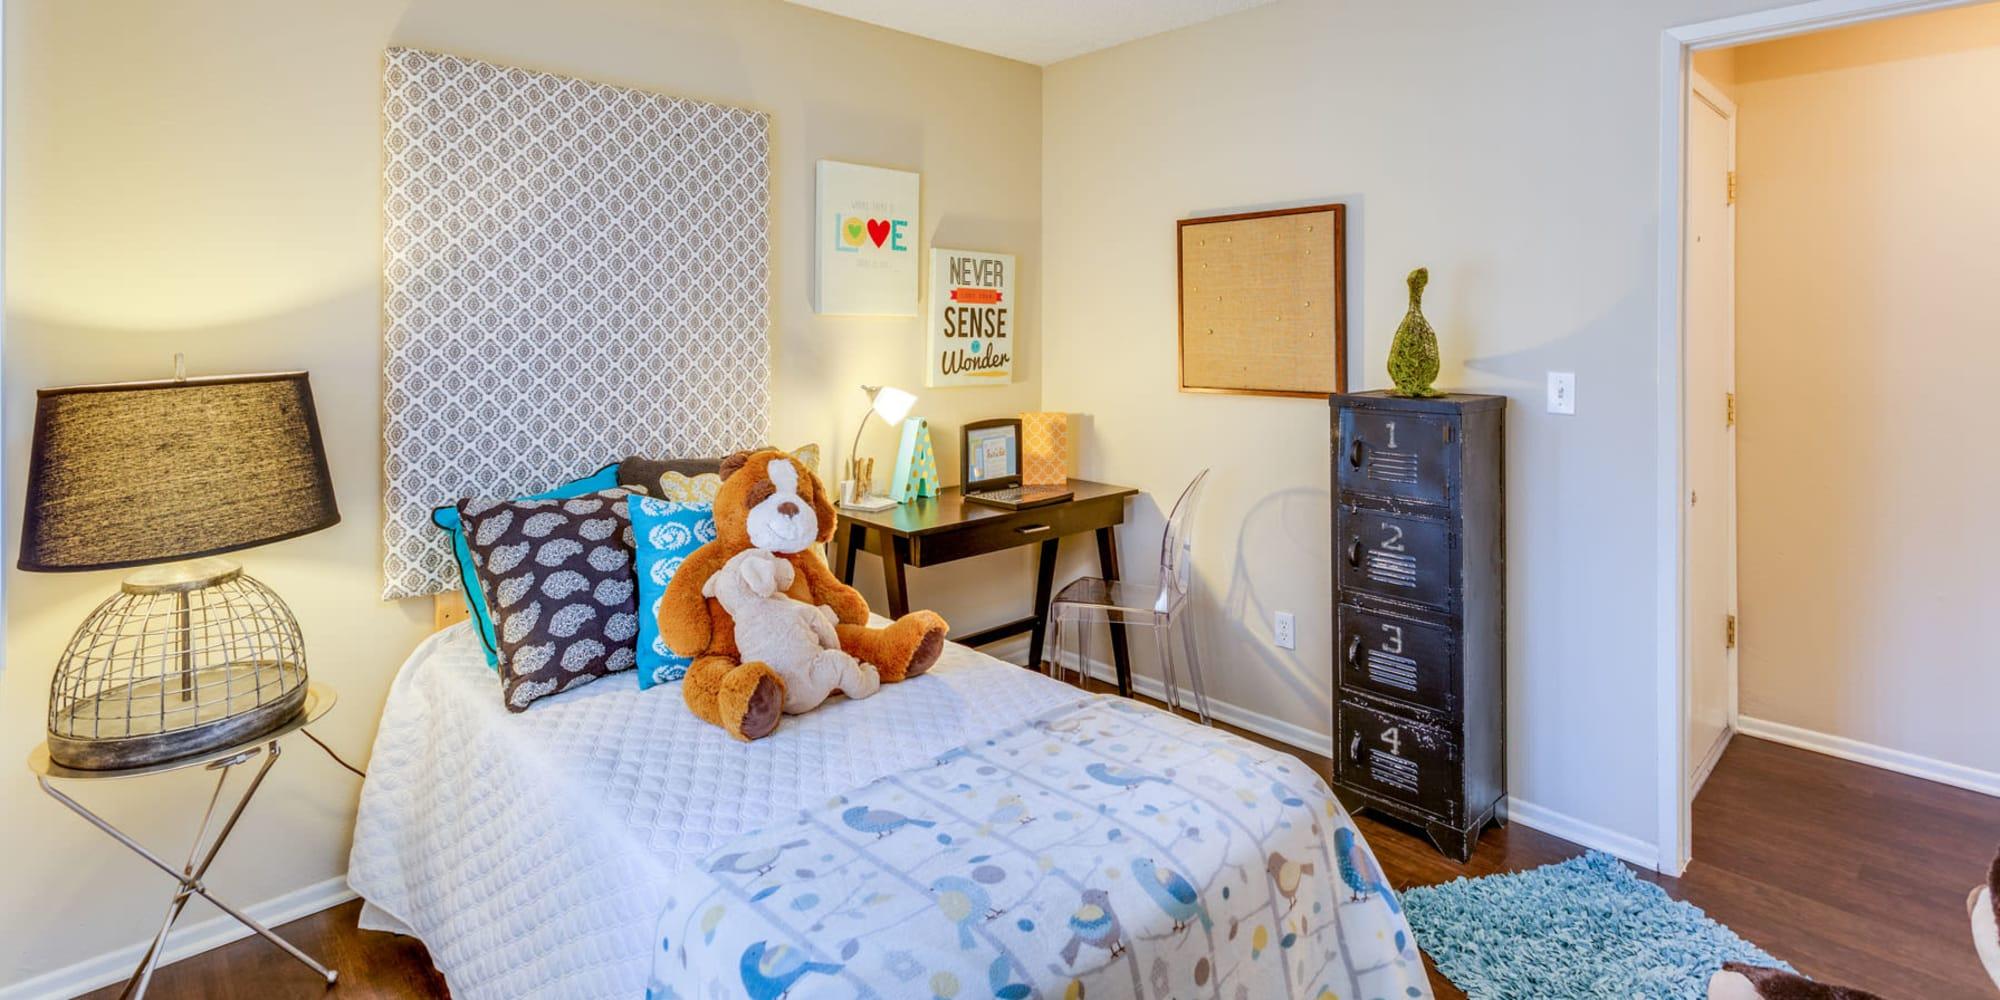 Hardwood flooring in a model child's bedroom at Mountain Vista in Victorville, California